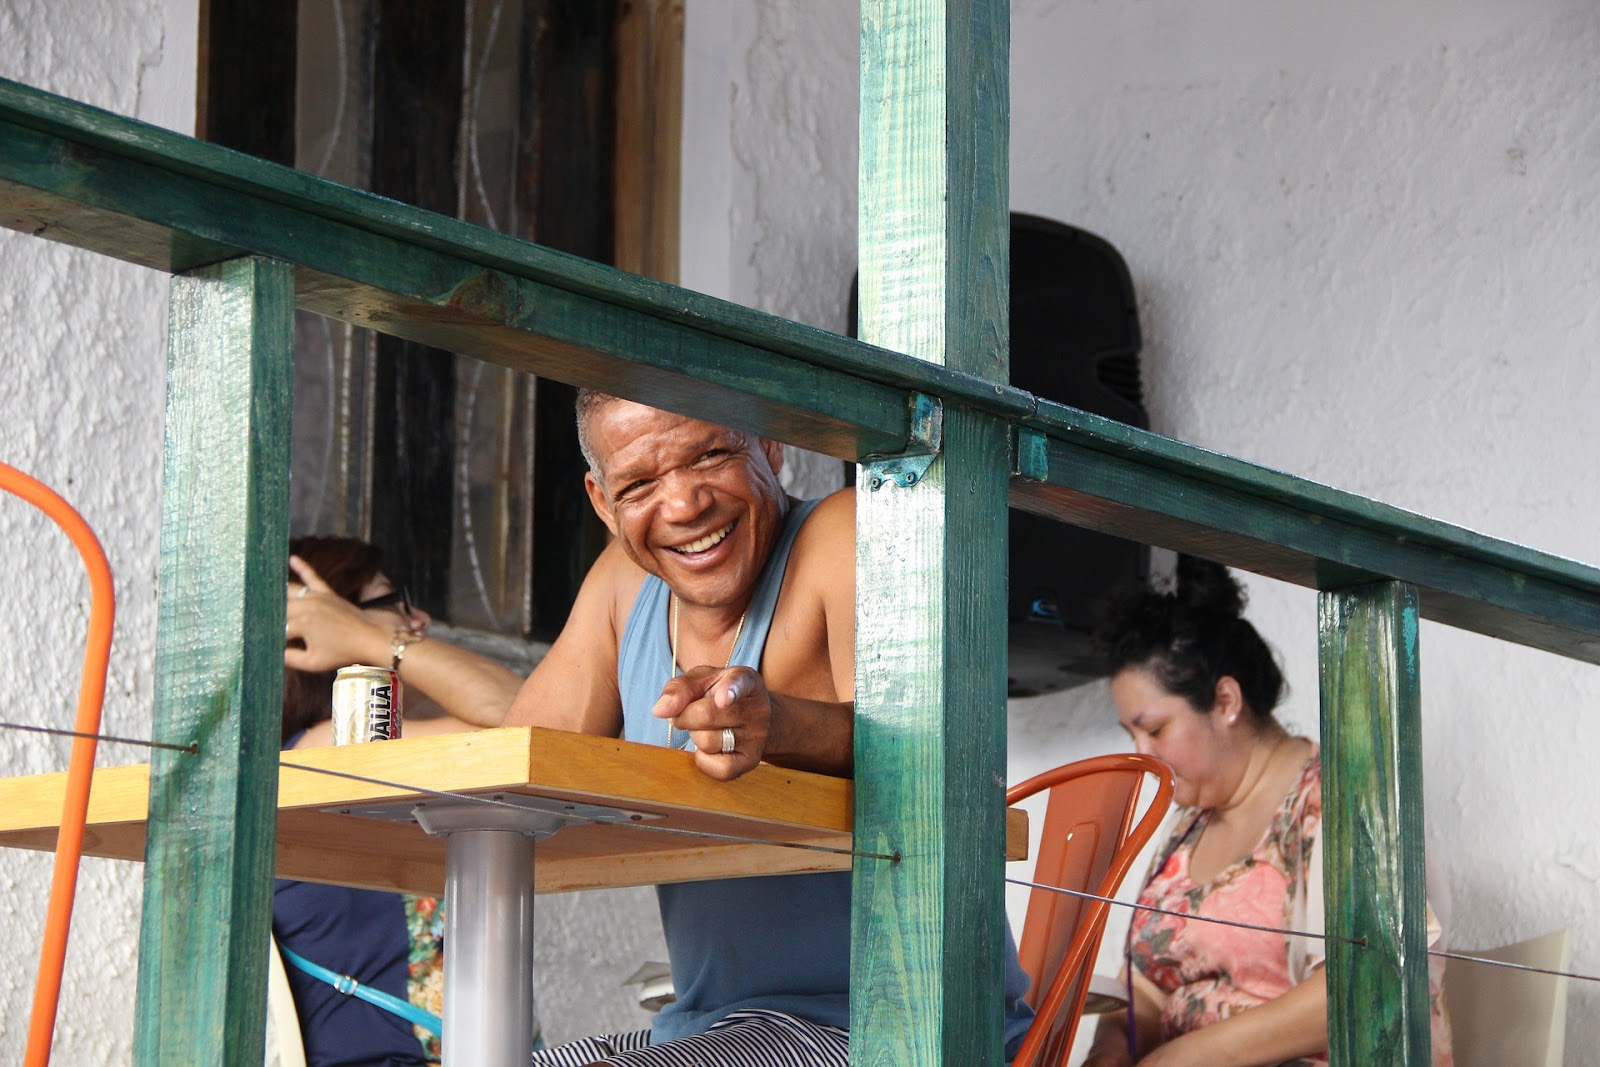 A man enjoy a restaurant in Puerto Rico